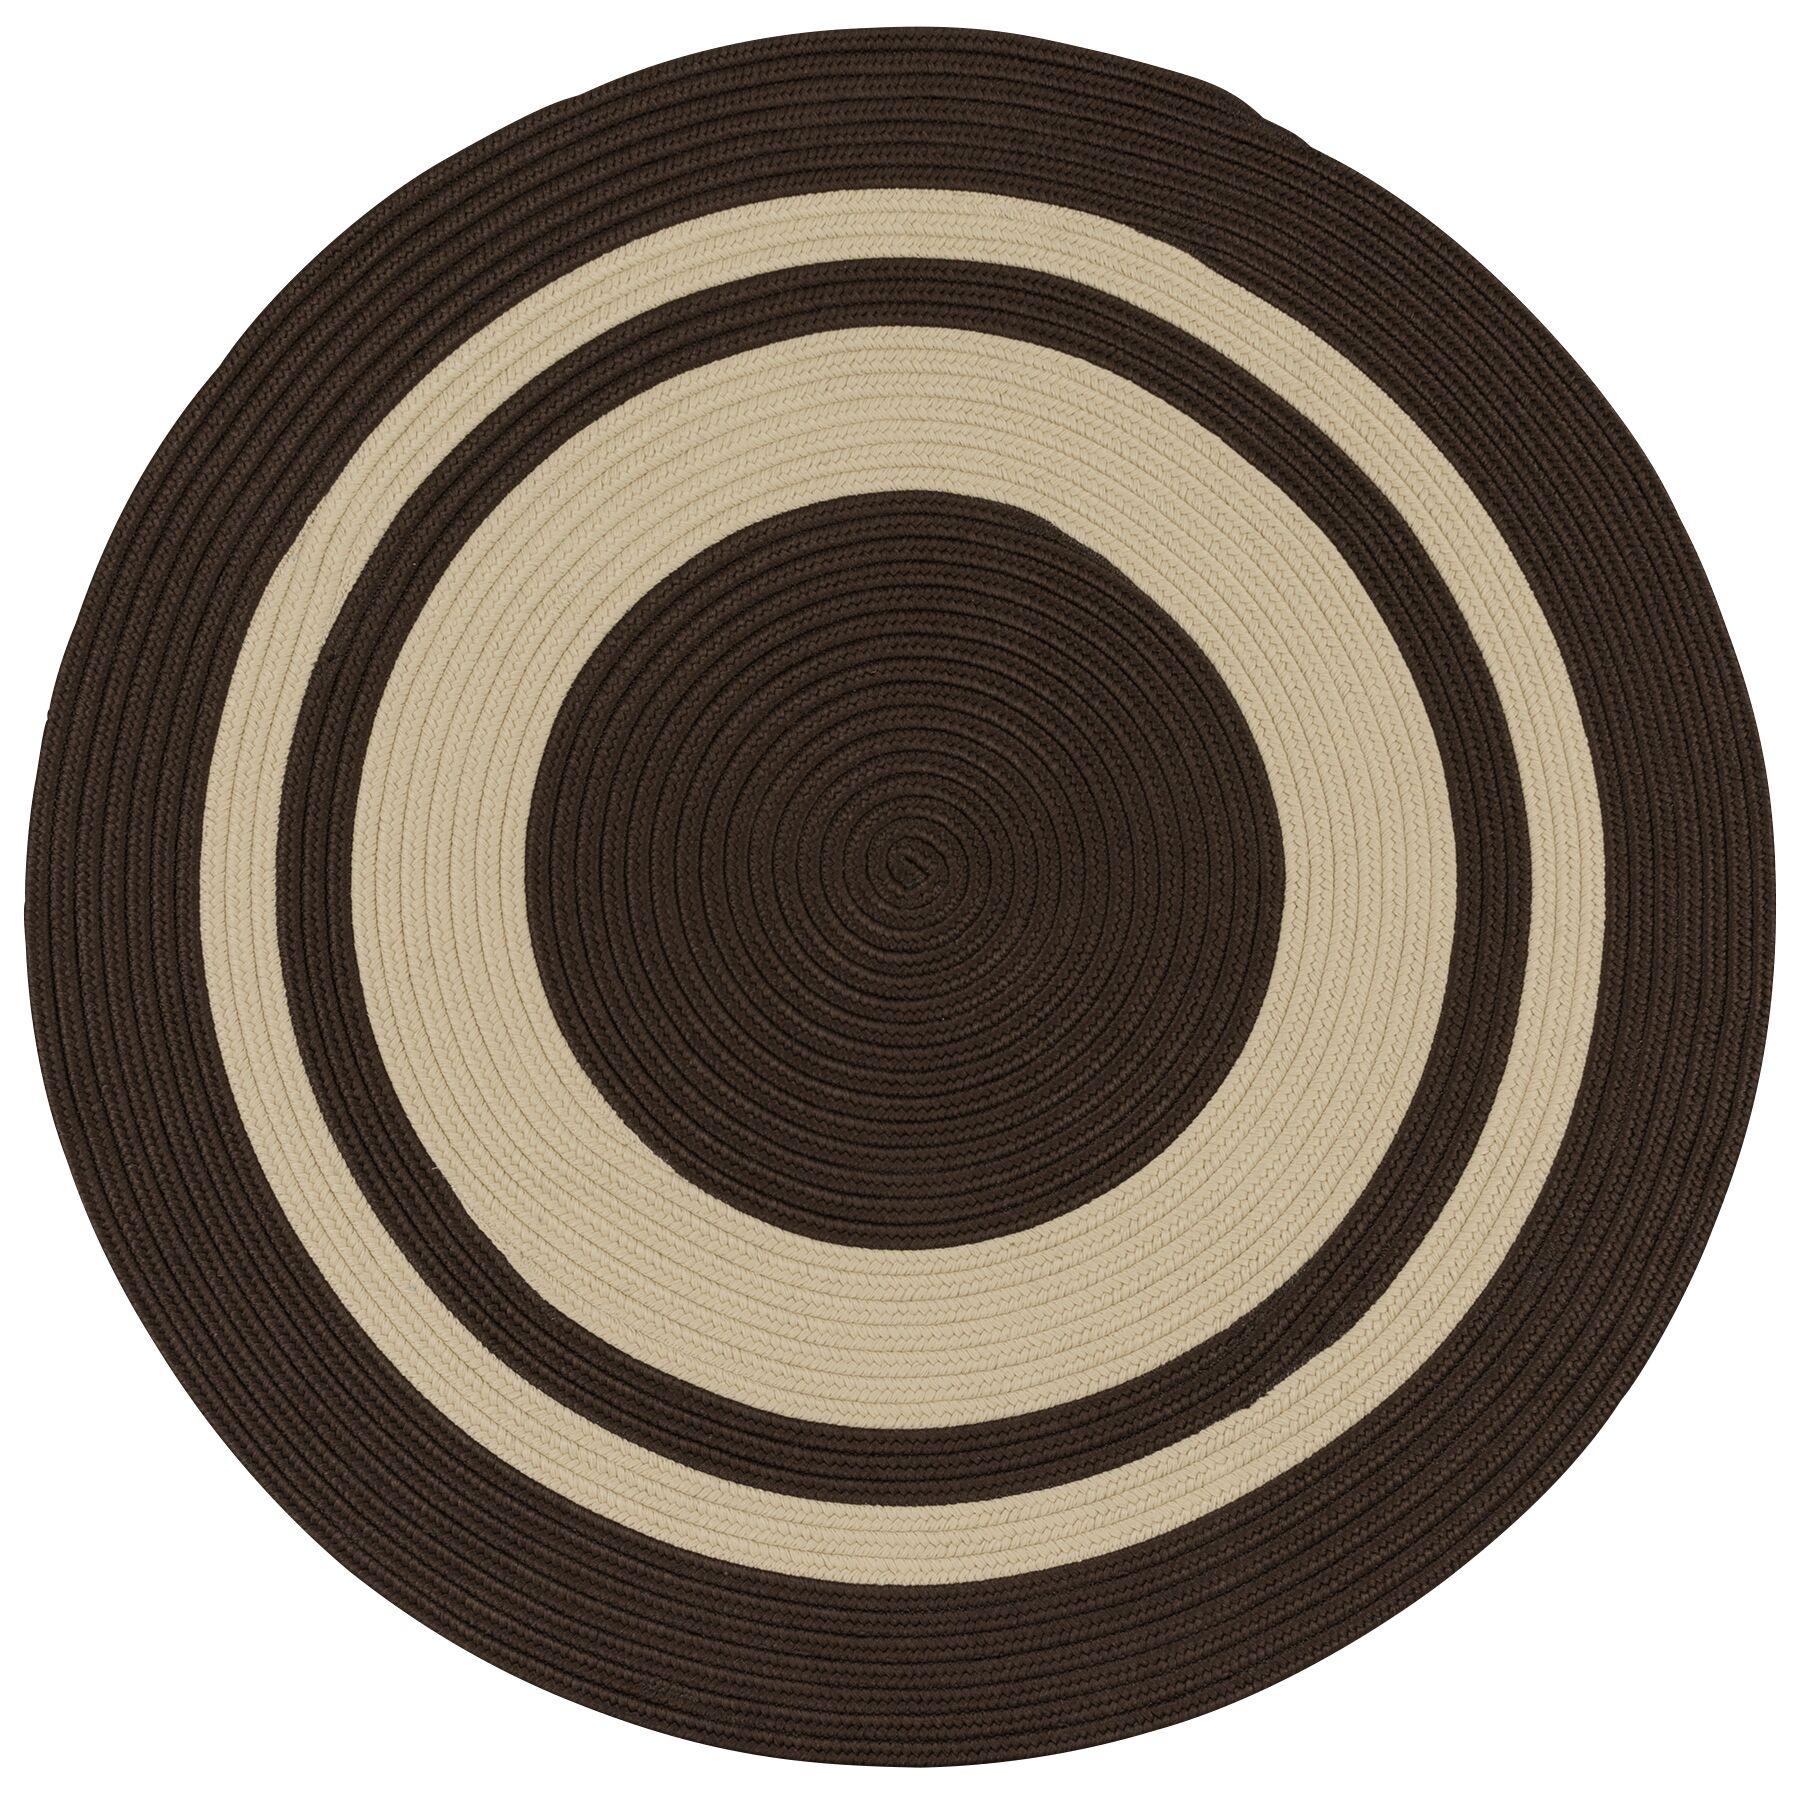 Don Hand-Braided Brown/Beige Indoor/Outdoor Area Rug Rug Size: Round 9'